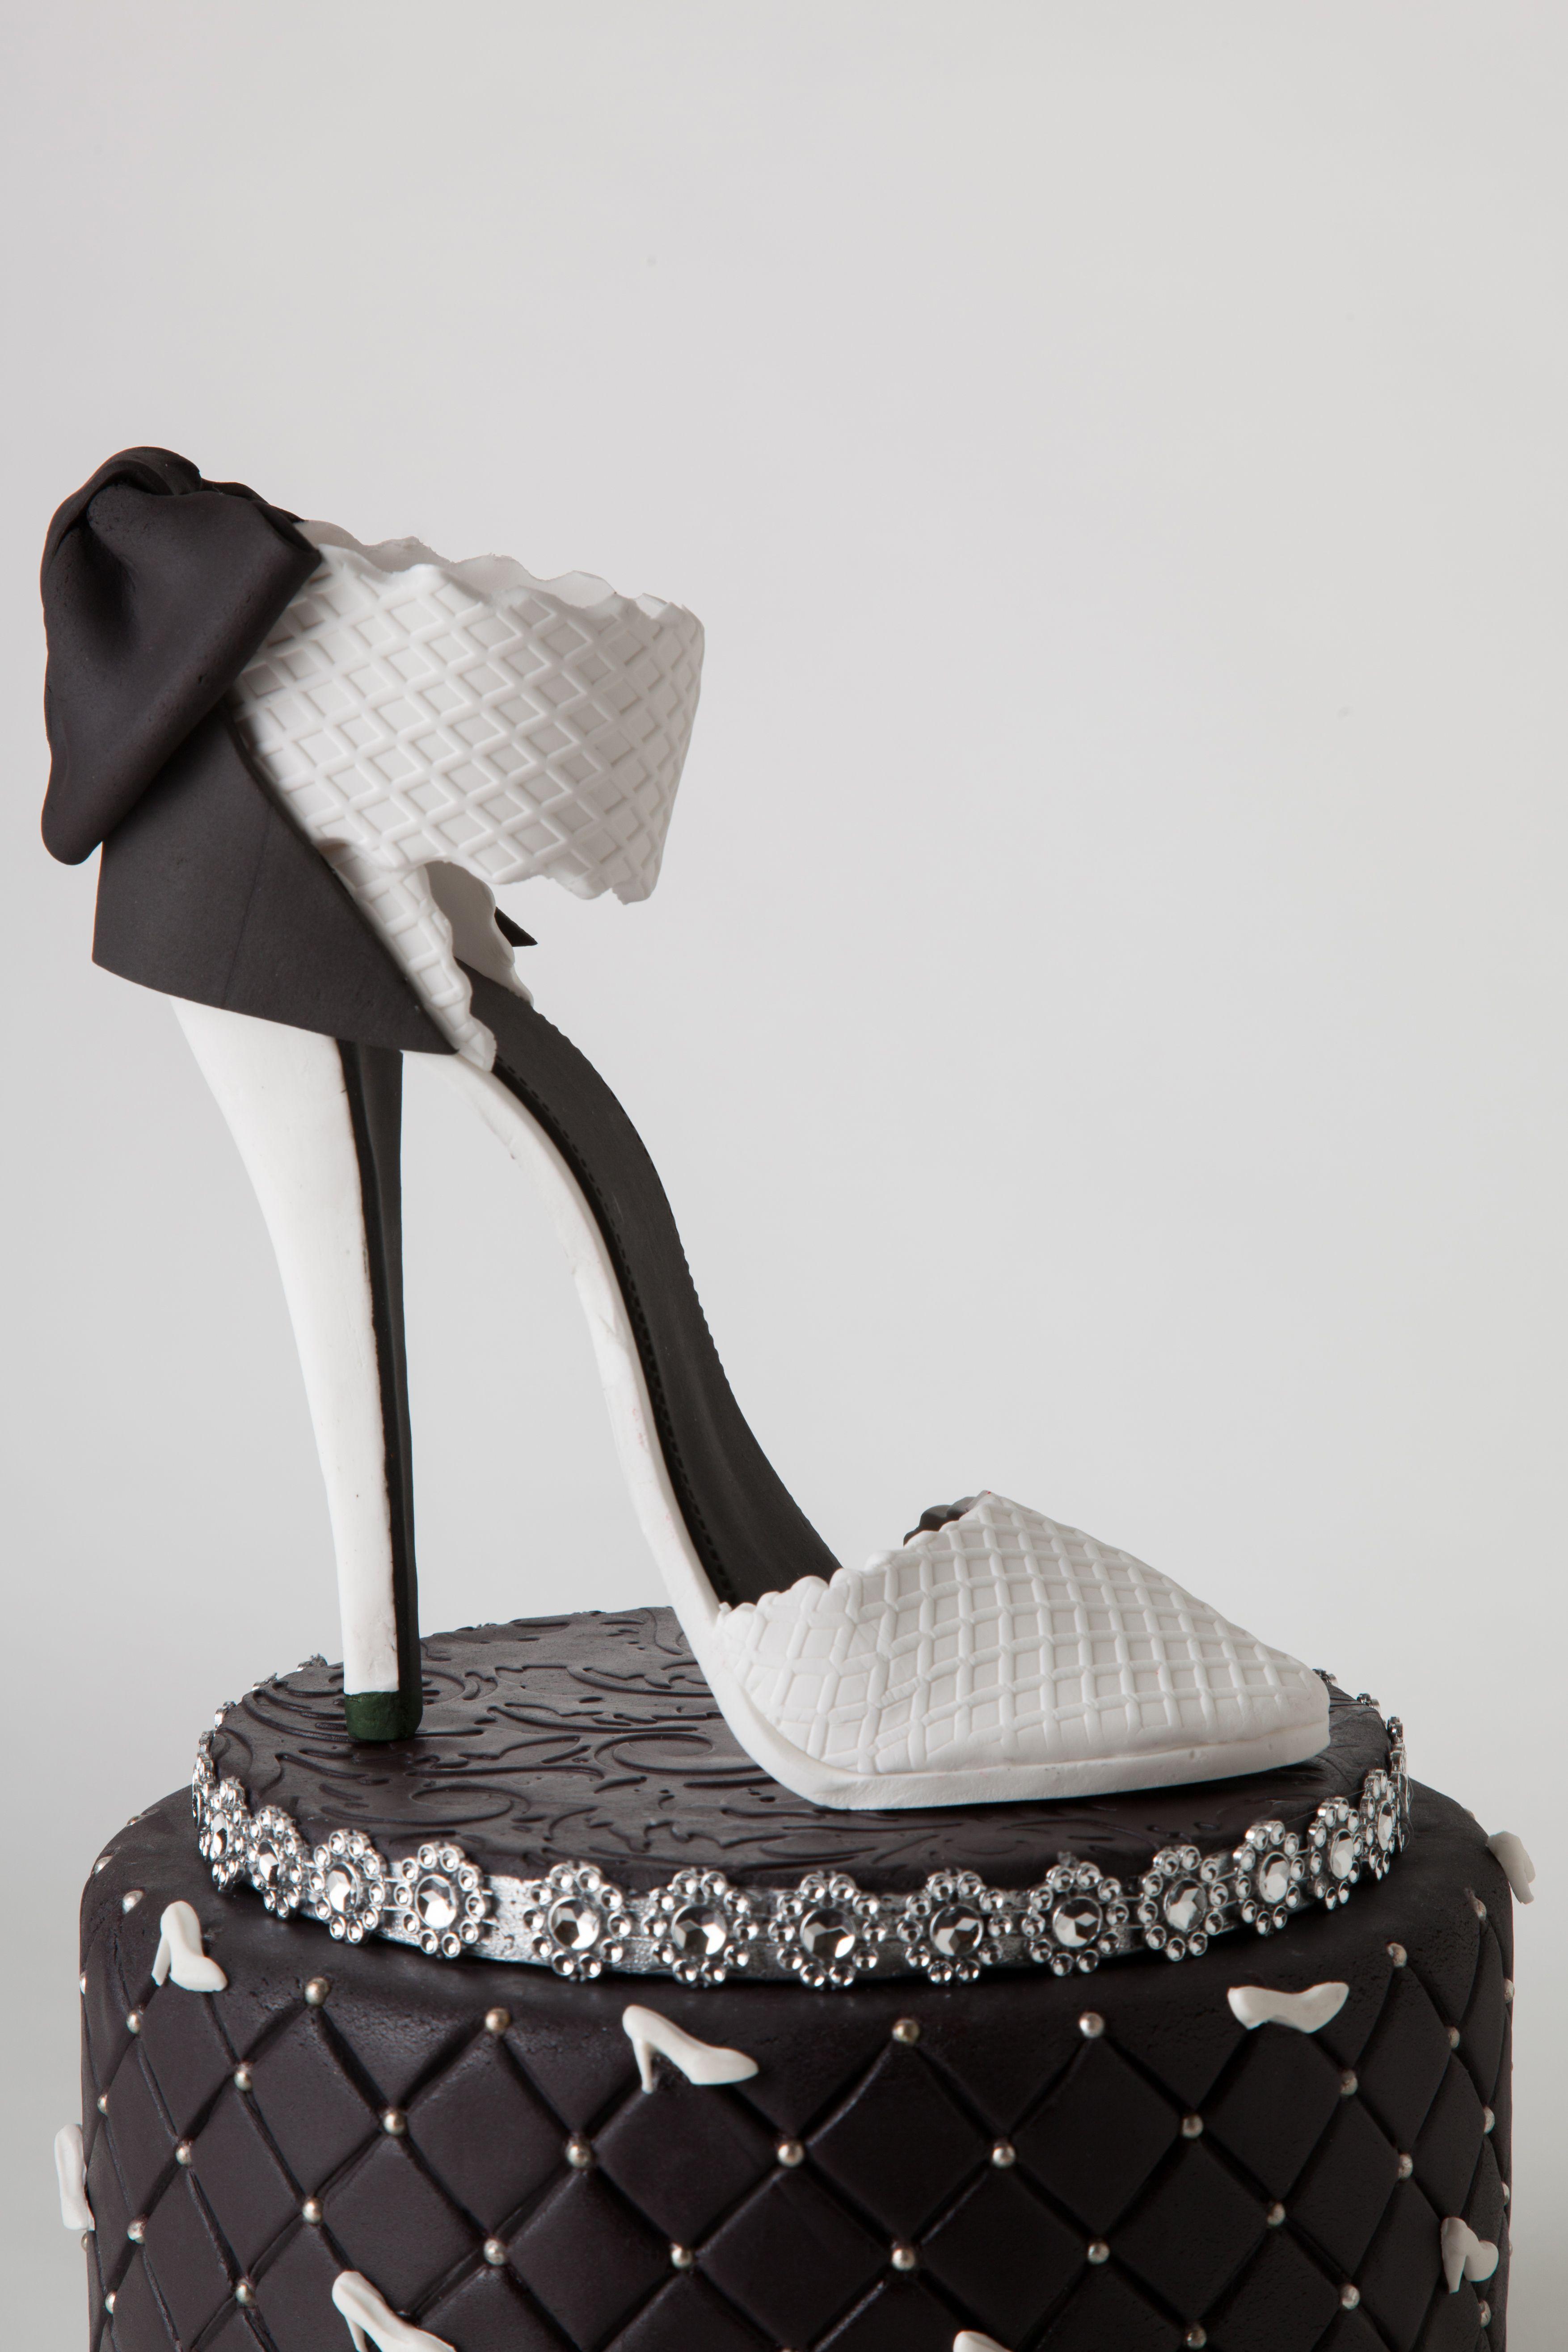 Remarkable Stiletto High Heel Shoe Kit By Ny Cake Cake Decorating Tools Make Funny Birthday Cards Online Kookostrdamsfinfo